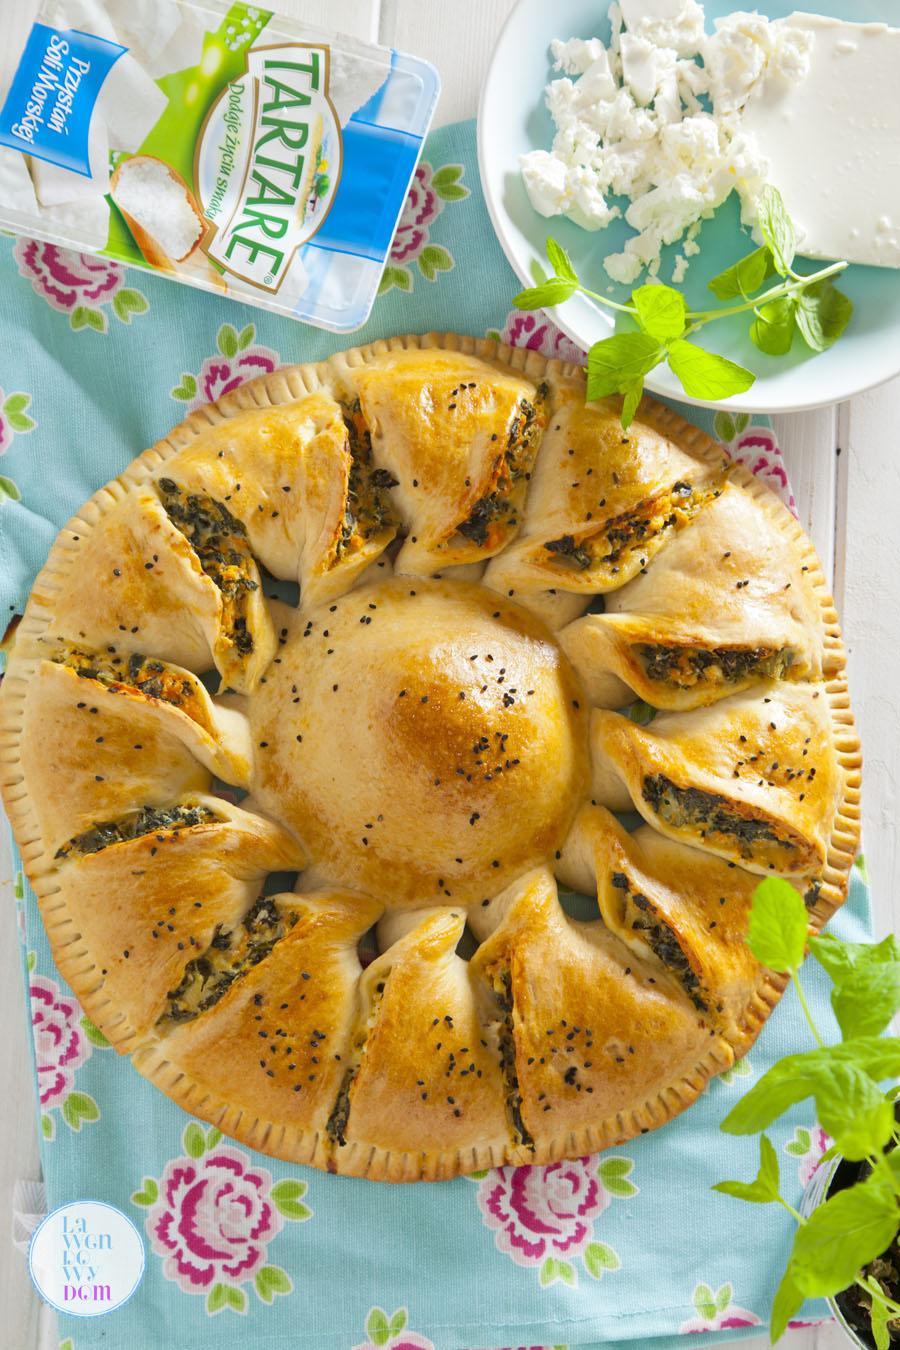 wegetarianskie-ciasto-z-jarmuzem-batatami-i-serem-tartar01